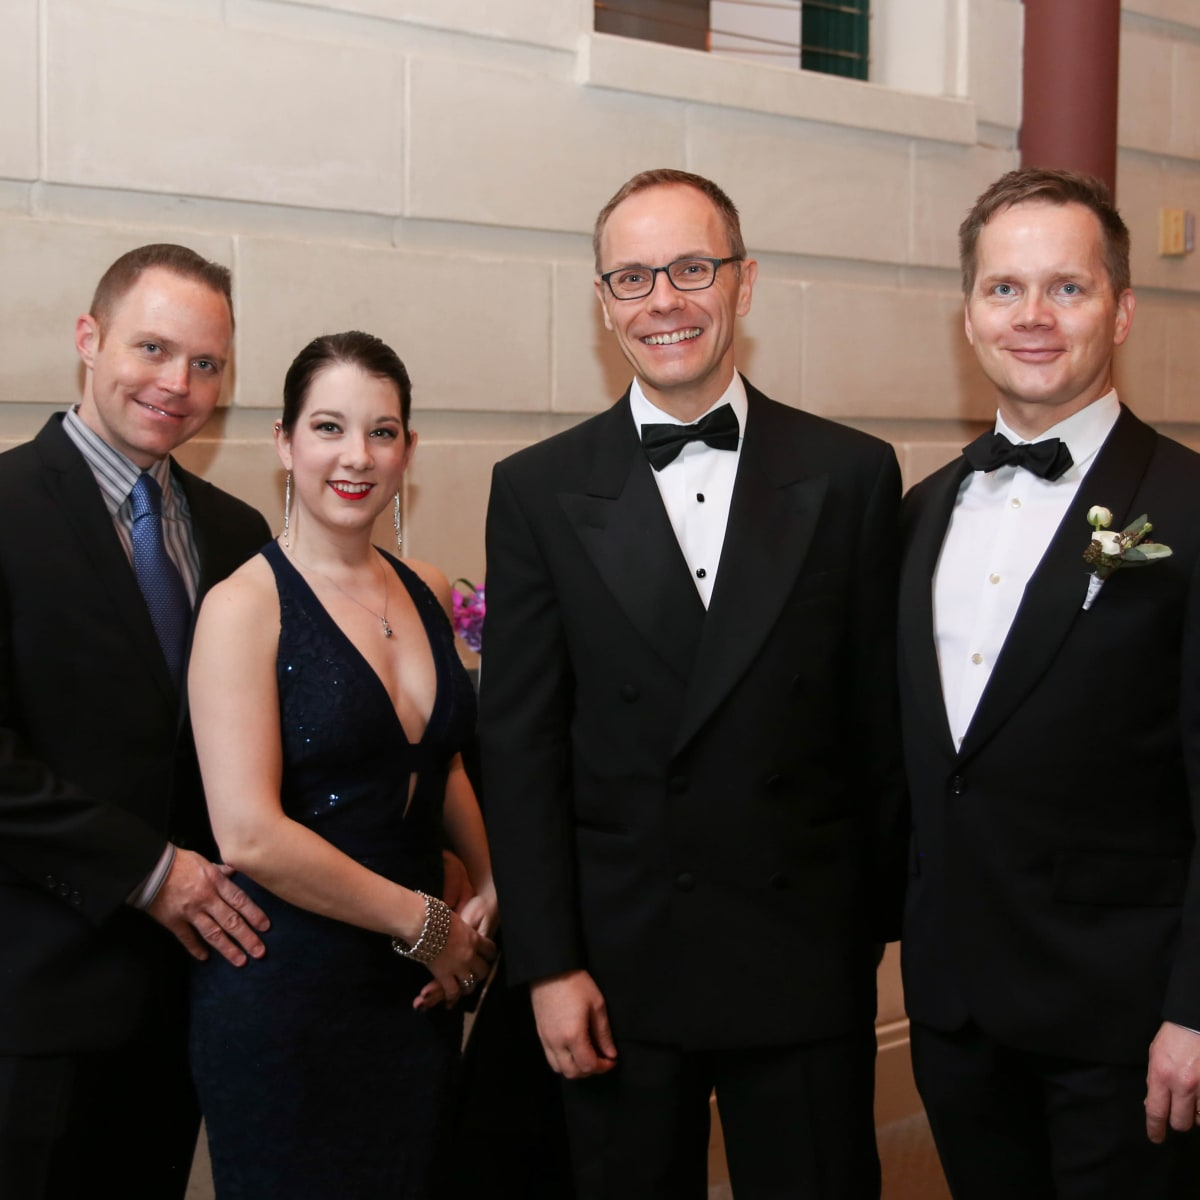 Fort Worth Opera Gala 2018, Kyle and Barbara Jordan, FWO Director Tuomas Hiltunen and Damon Clyde